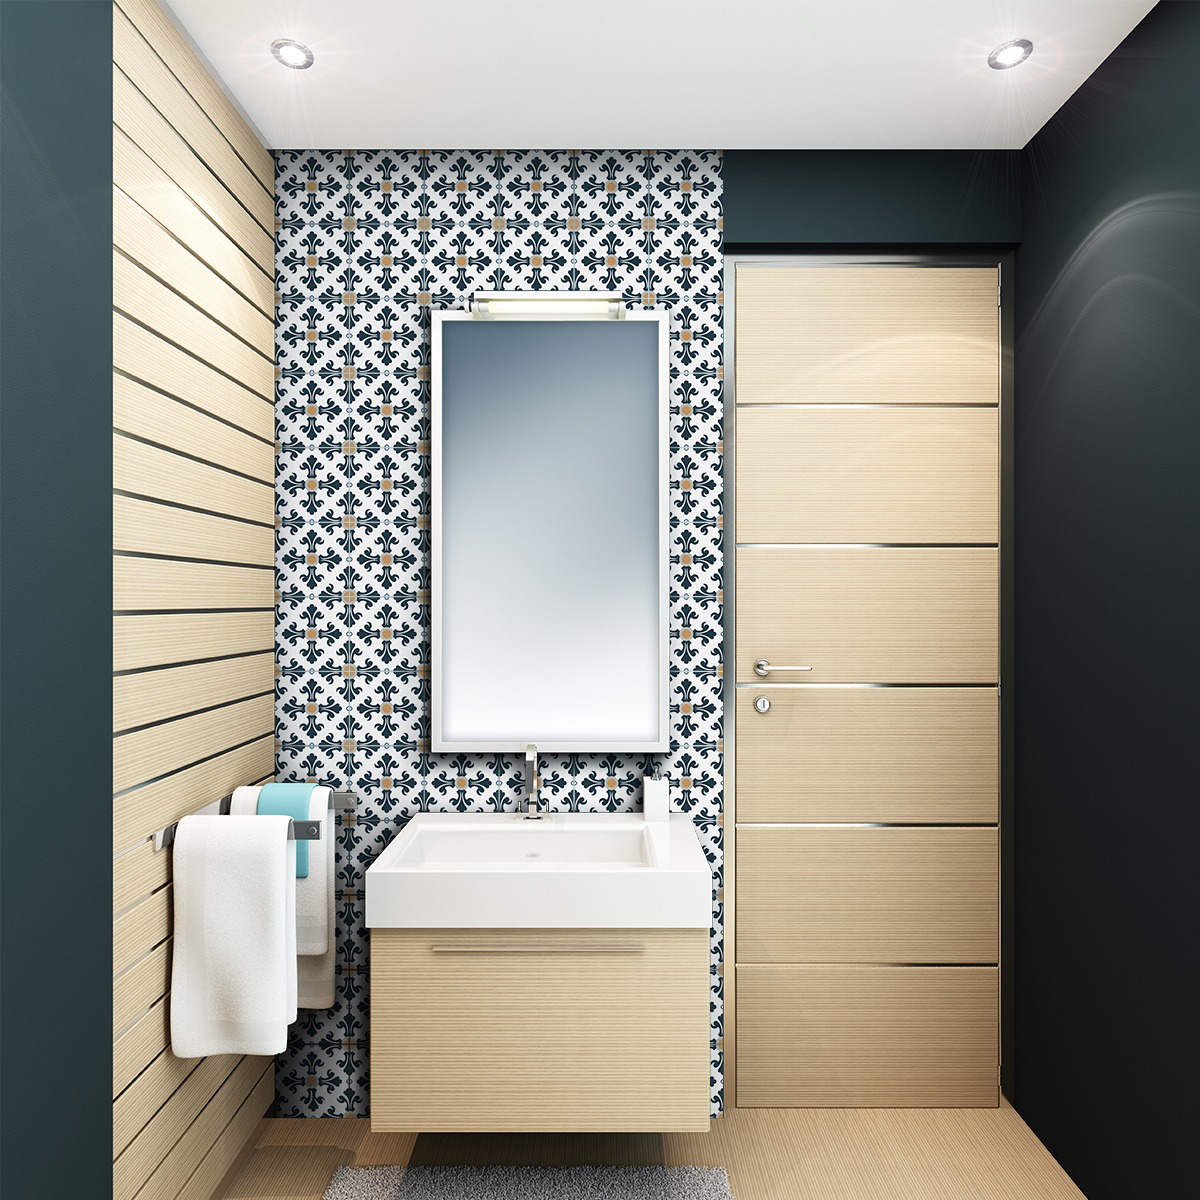 30 stickers carreaux de ciment azulejos aniela cuisine. Black Bedroom Furniture Sets. Home Design Ideas